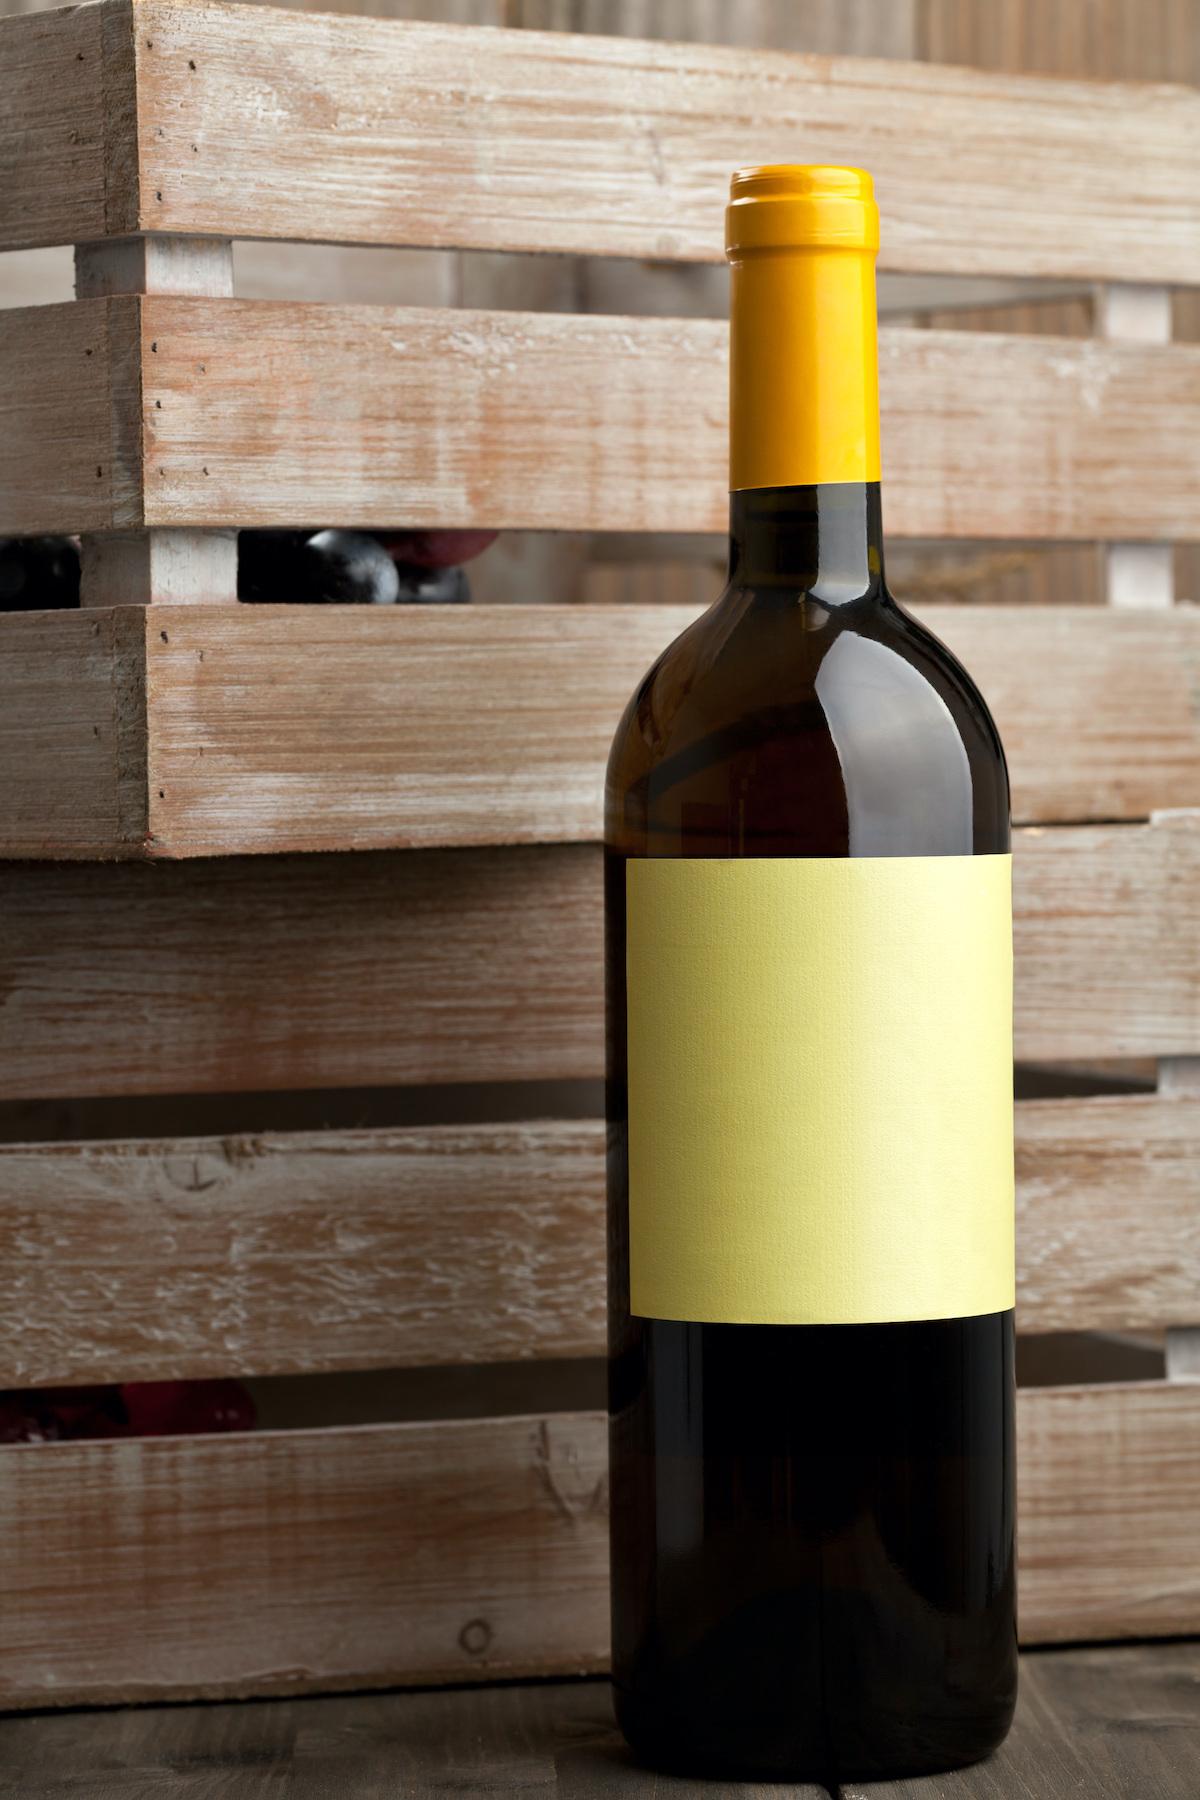 Vin étiquette vierge ©Shawn Hempel Shutterstock